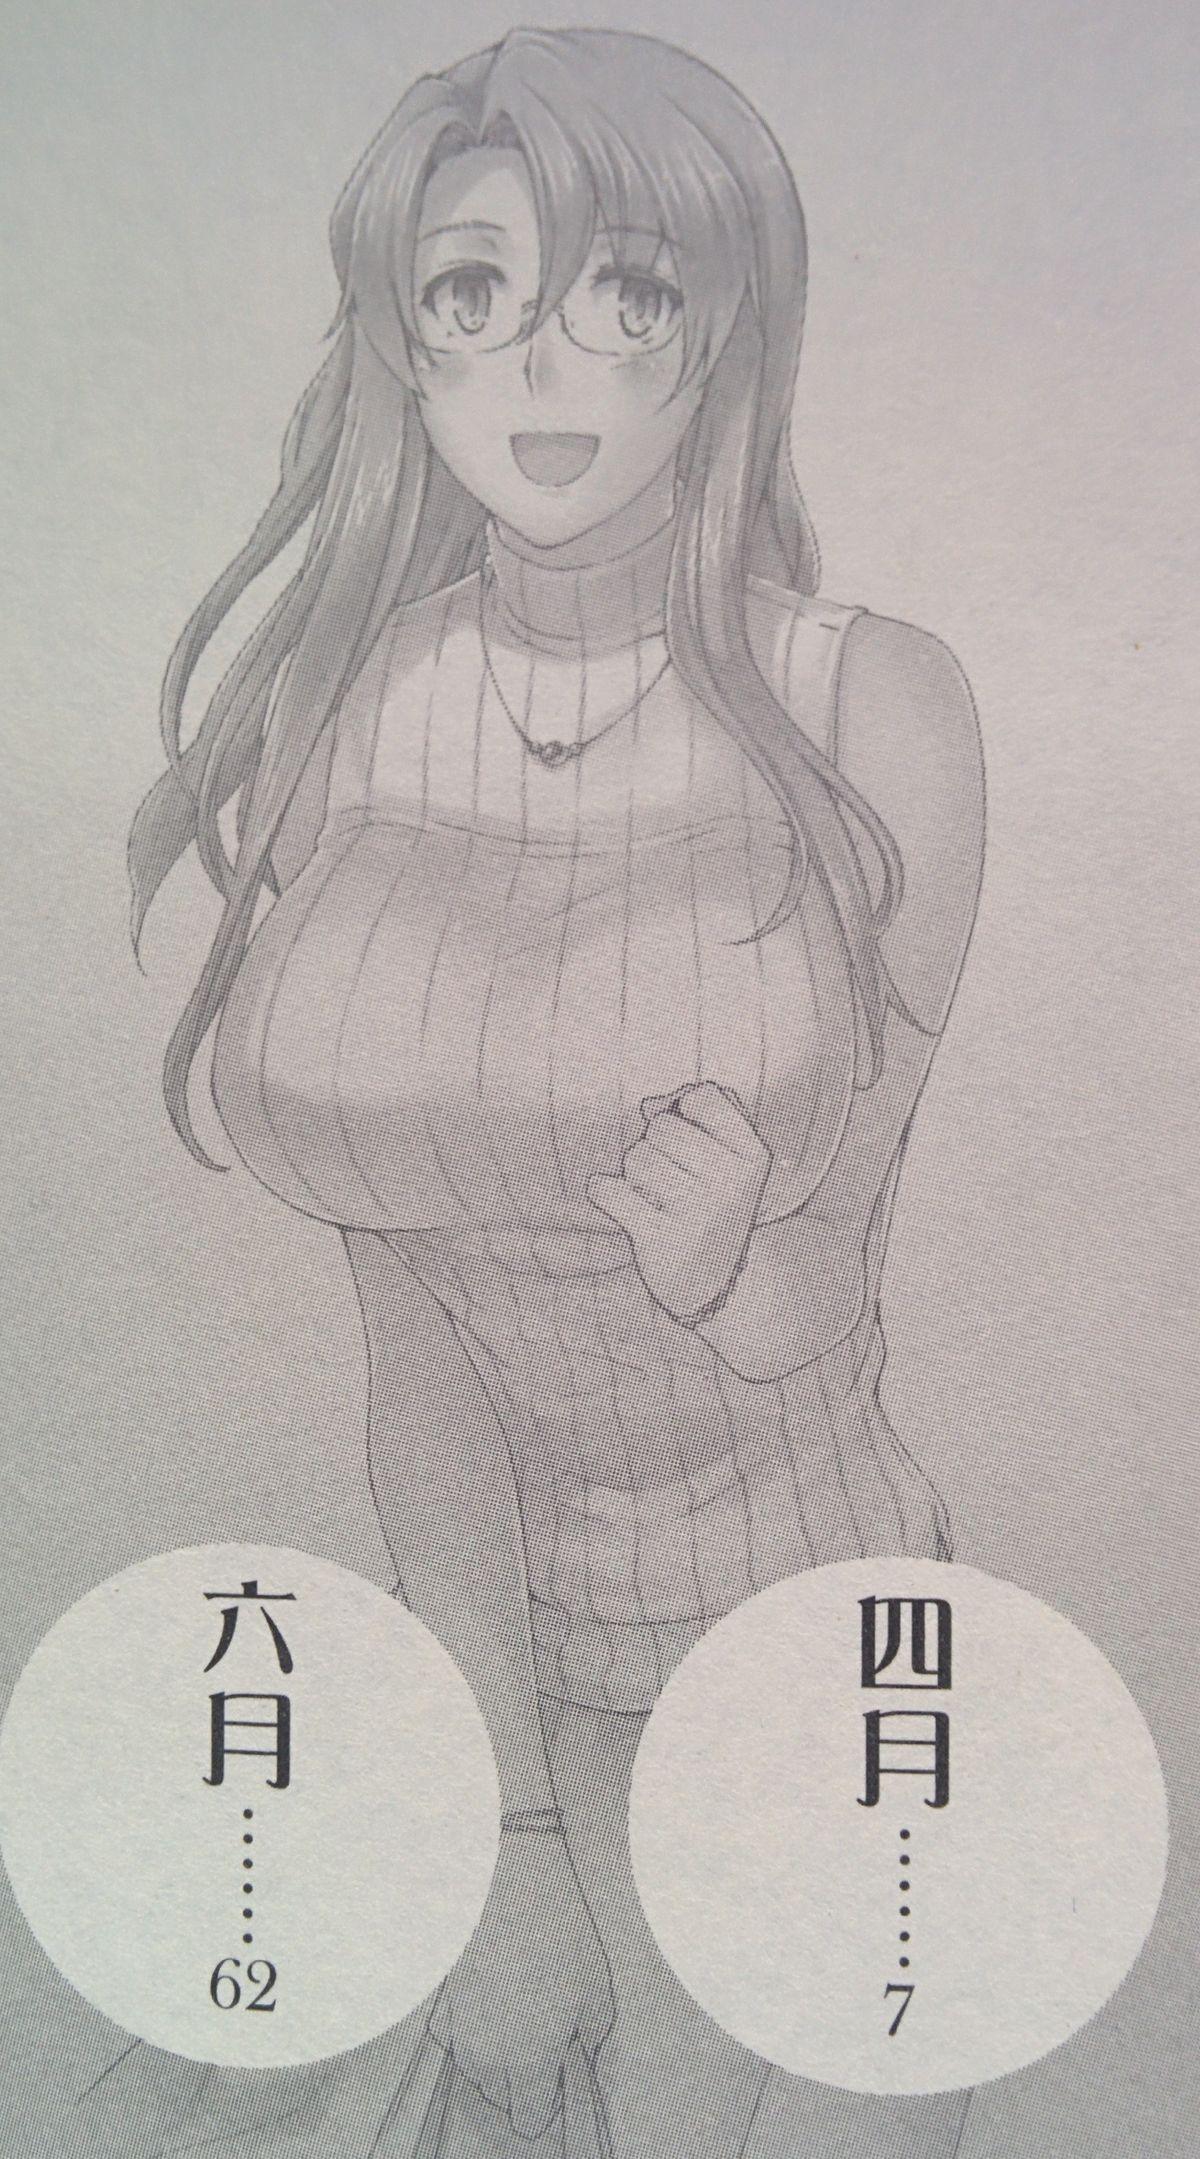 MTSP Tachibana Household's affairs with men 4